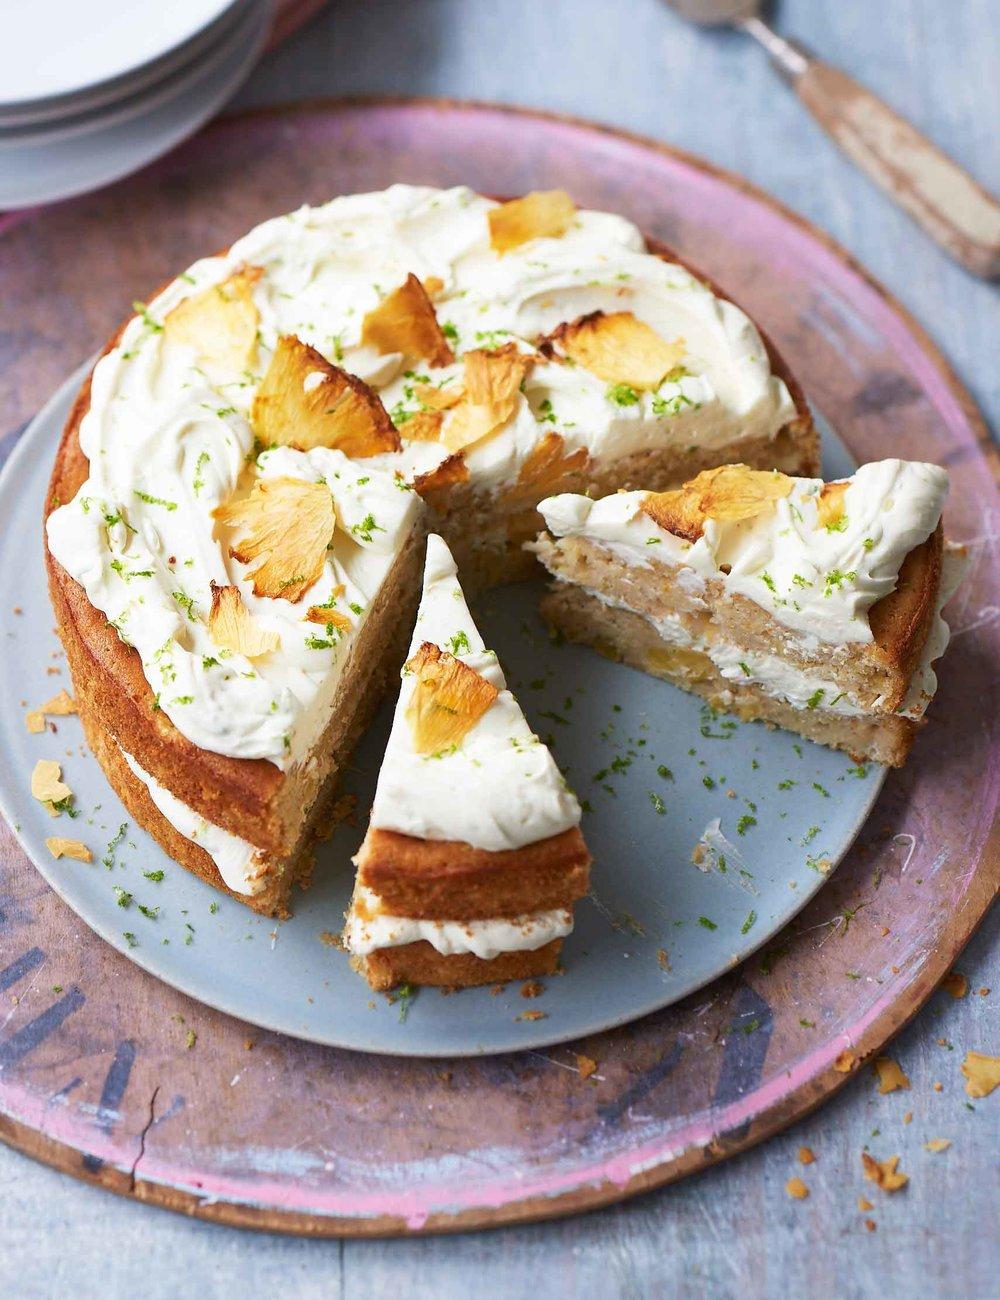 Groovy_Pineapple_Cake9326.jpg